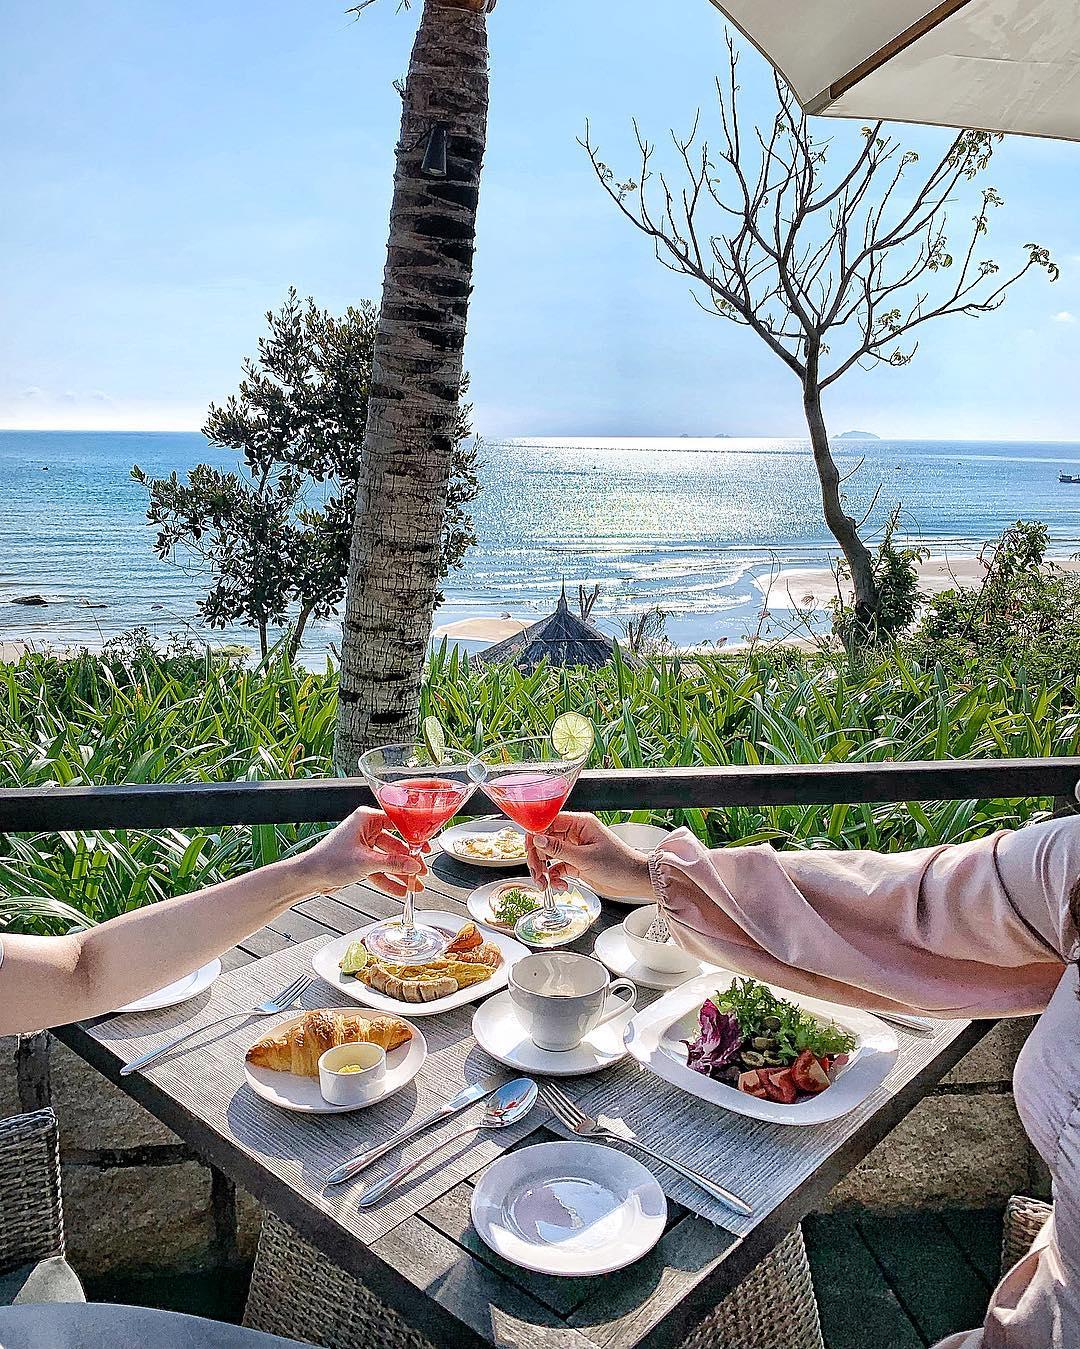 resort meal looking at the beach in Crown Retreat Quy Nhon, Vietnam